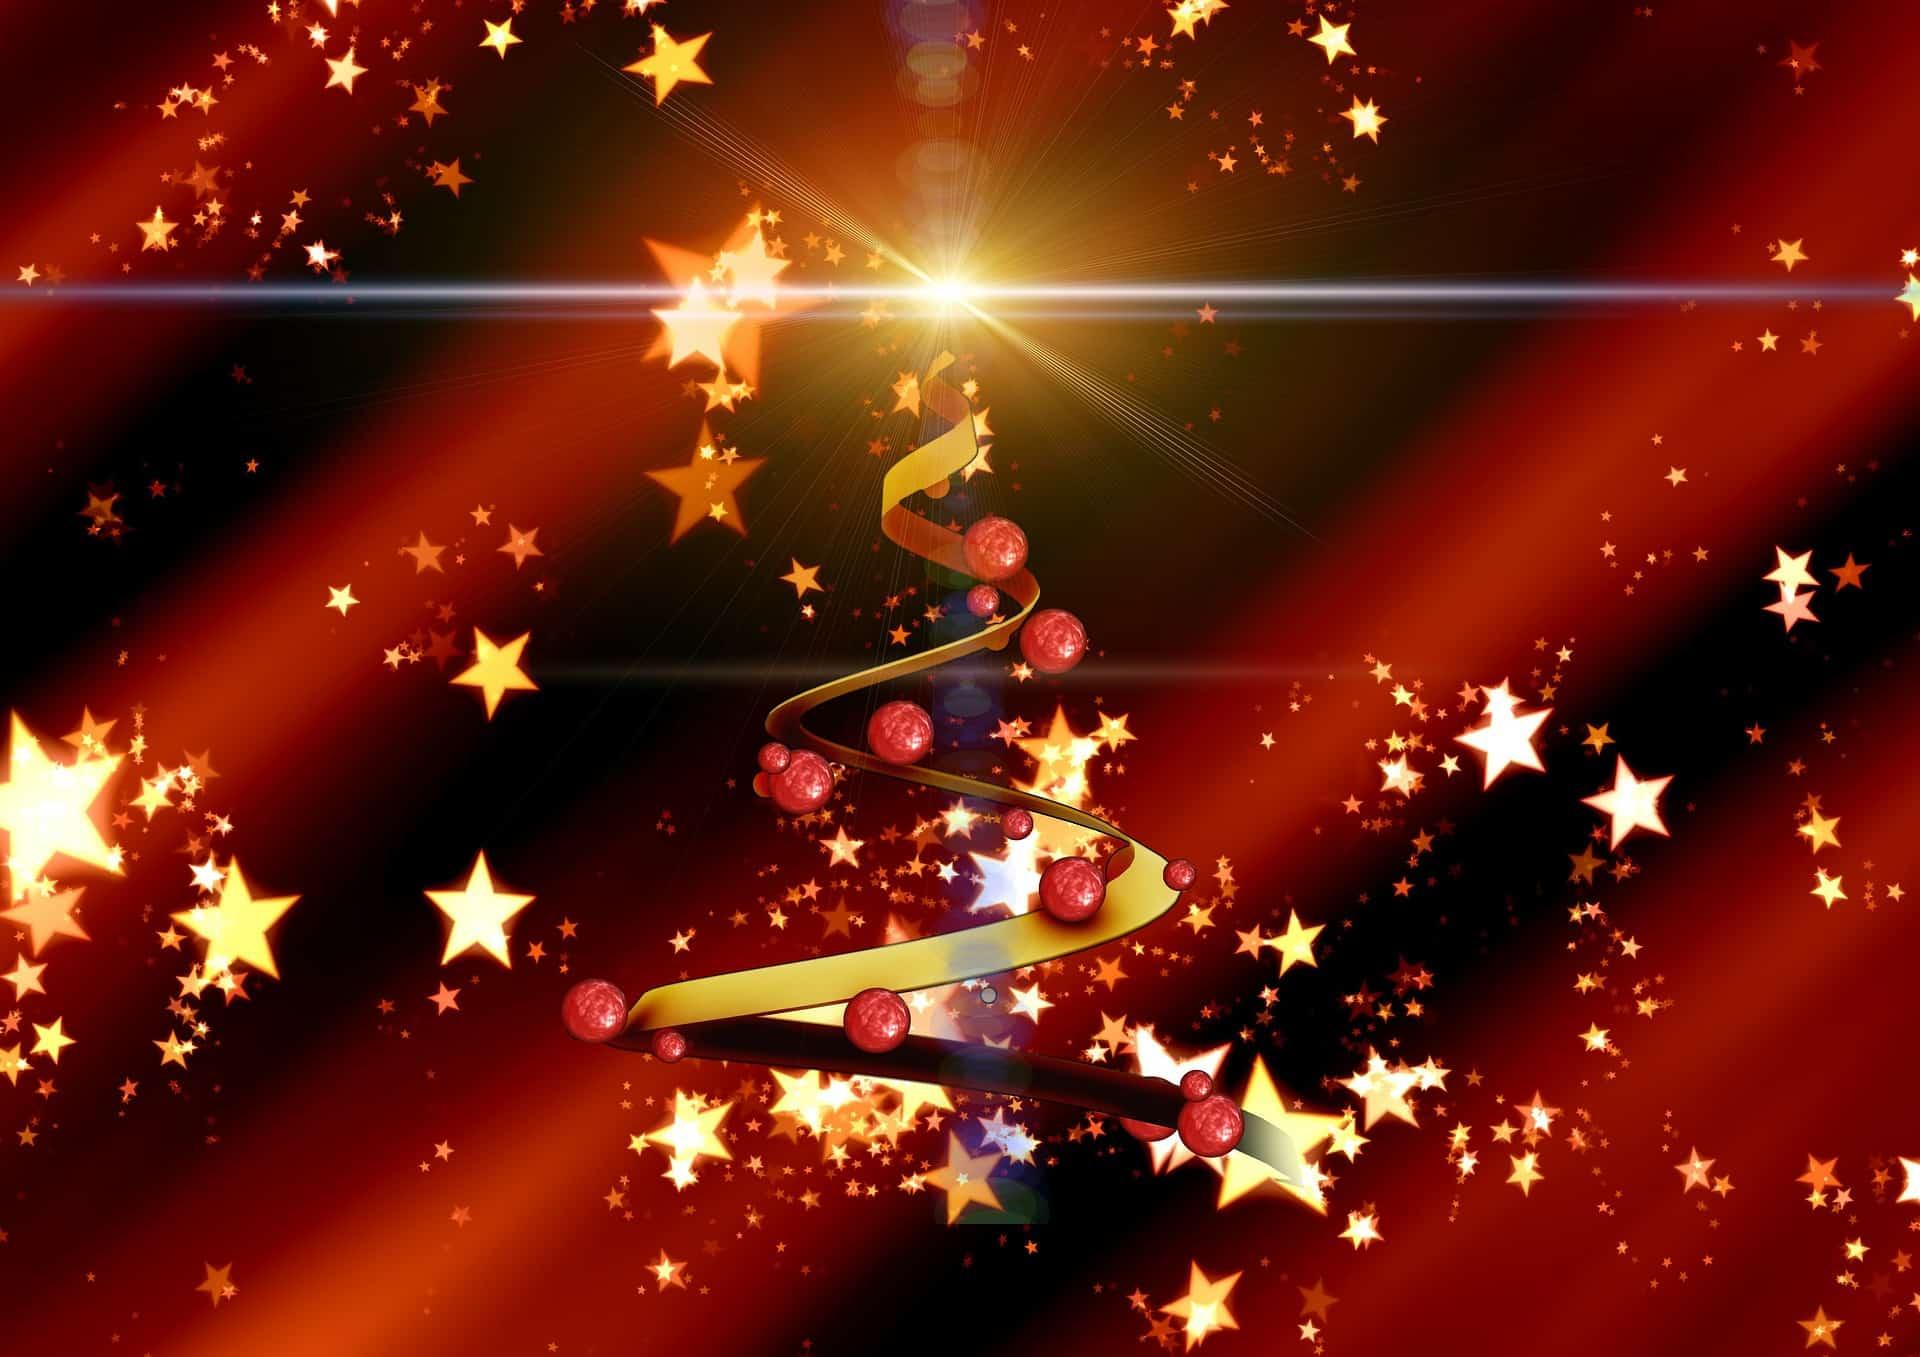 rituales y hechizos fin de ano